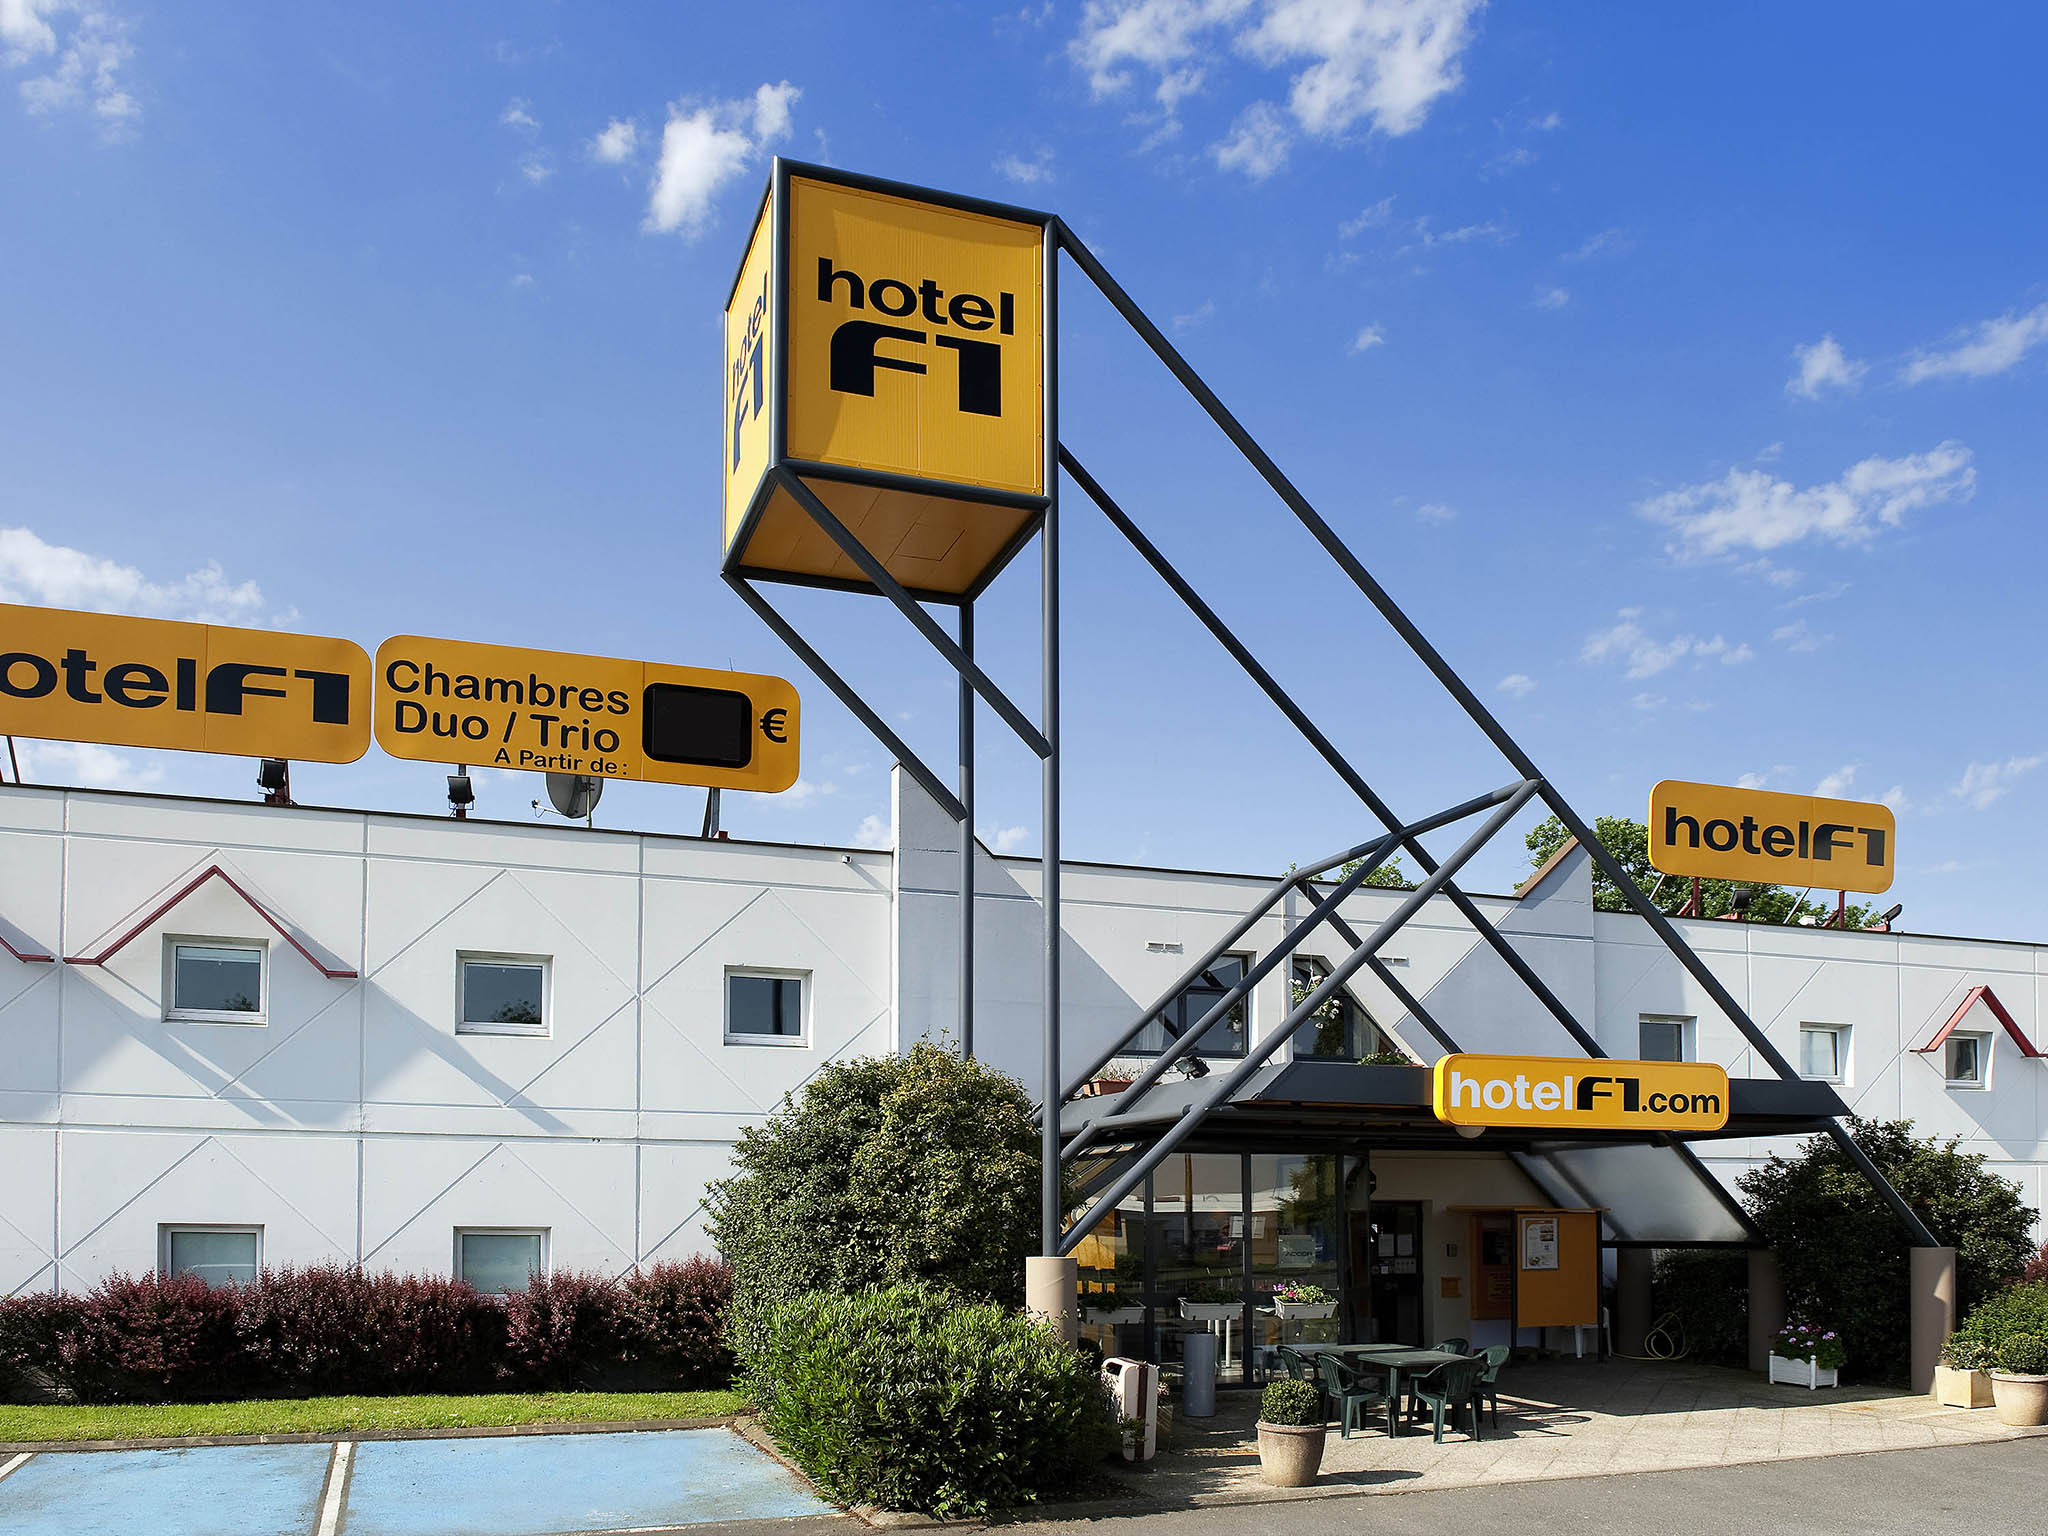 ホテル – hotelF1 Périgueux Boulazac